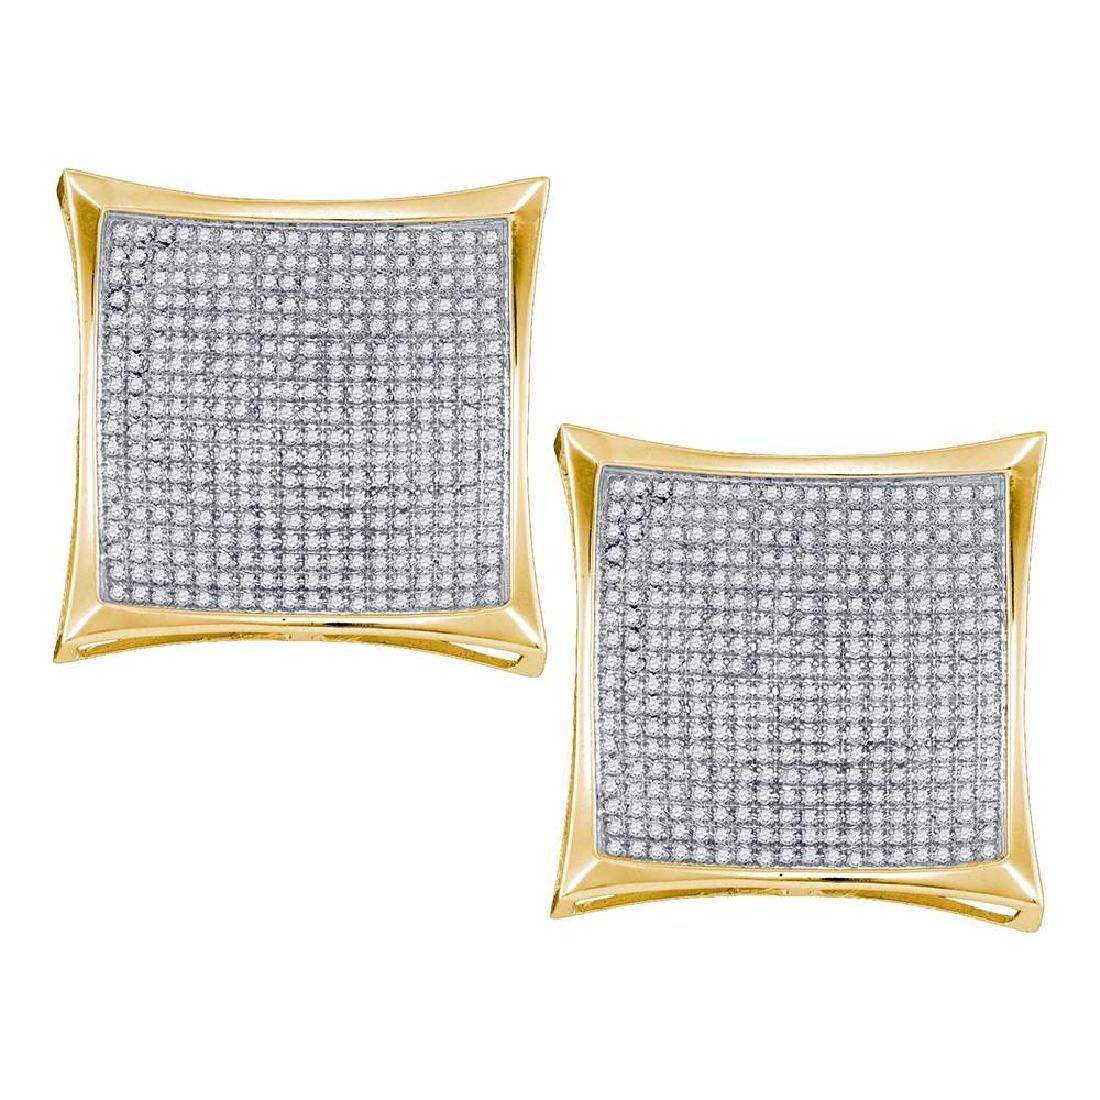 2.01 CTW Diamond Square Kite Cluster Screwback Earrings